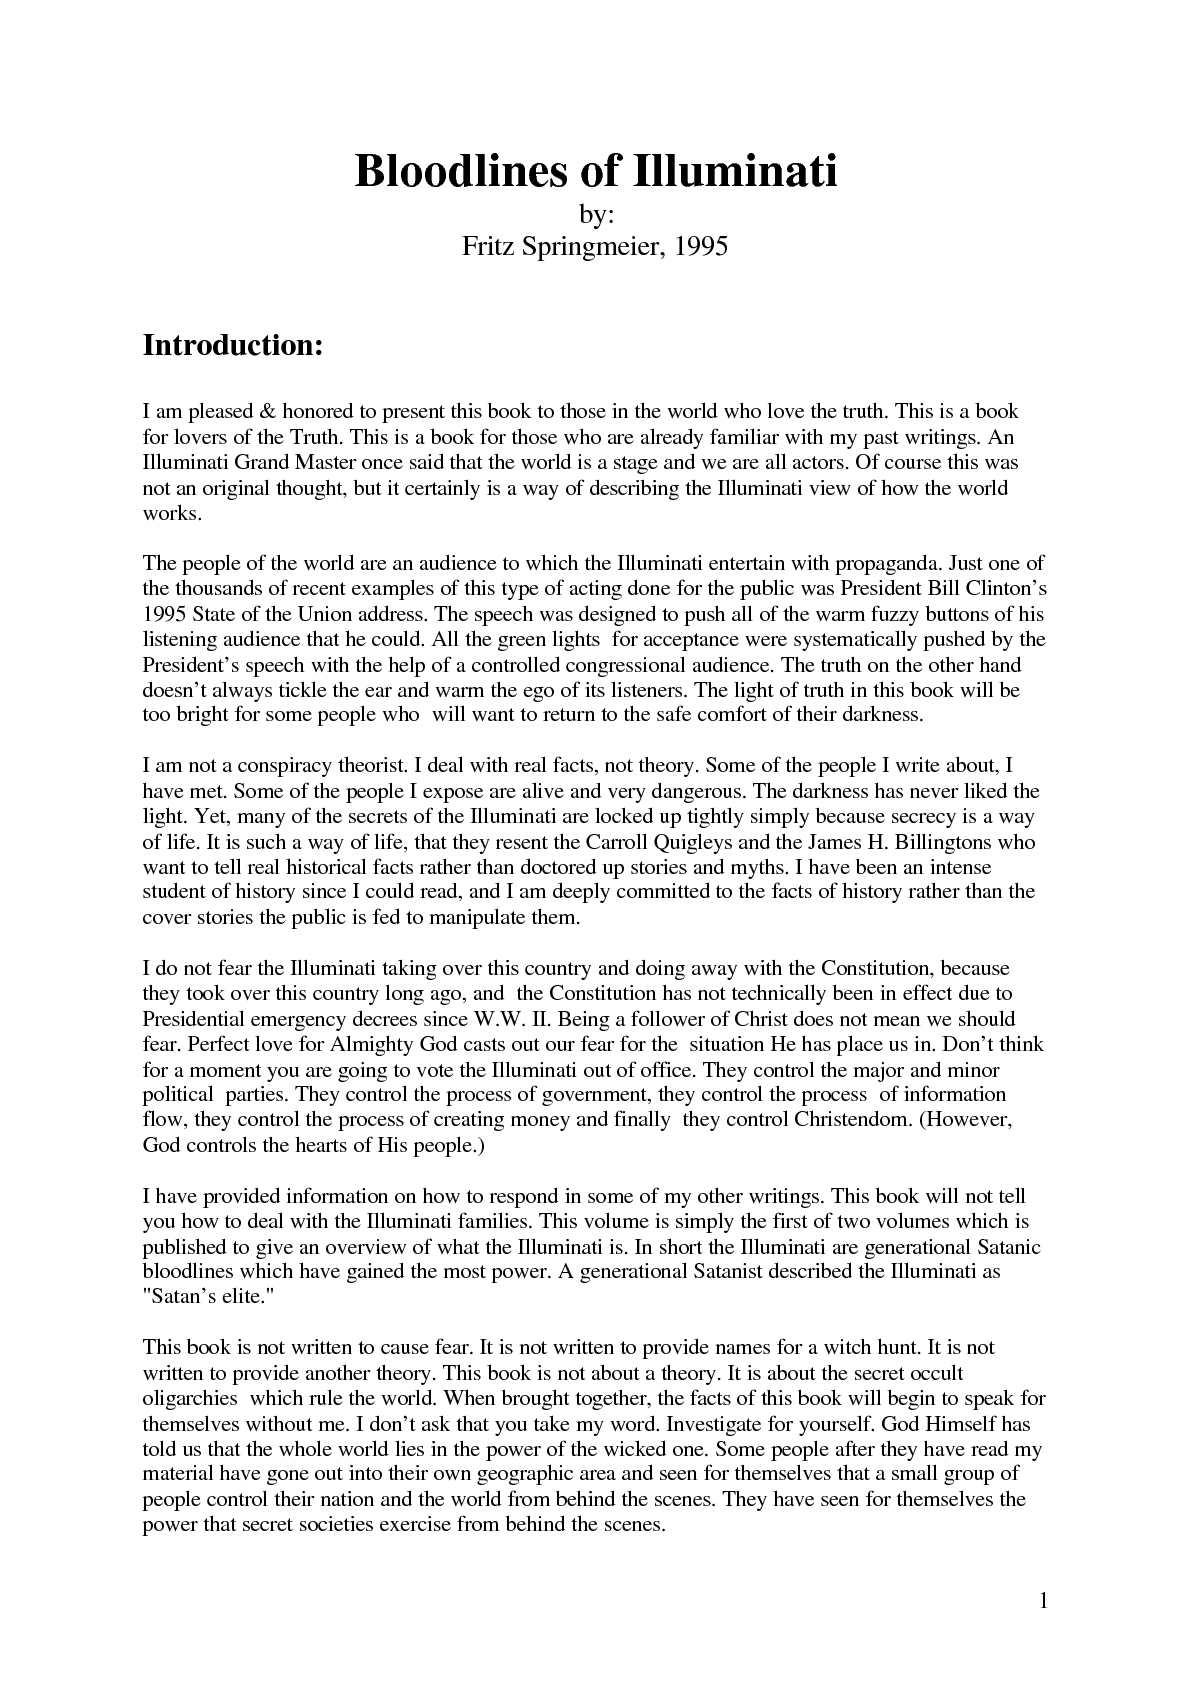 David Icke - Bloodlines of the Illuminati